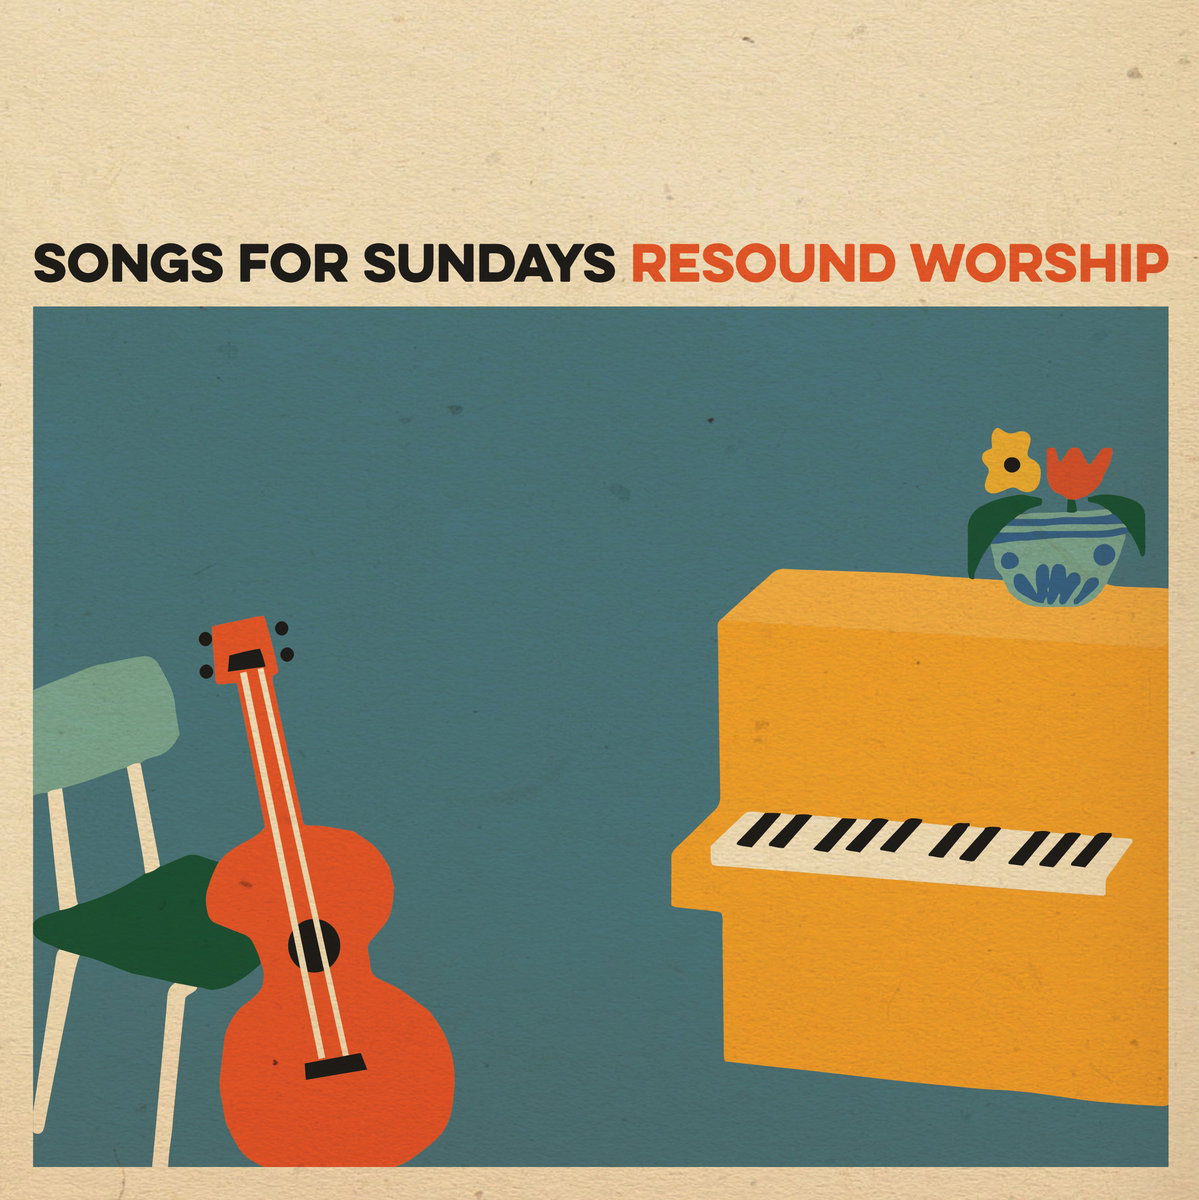 Songs for Sundays | Resound Worship